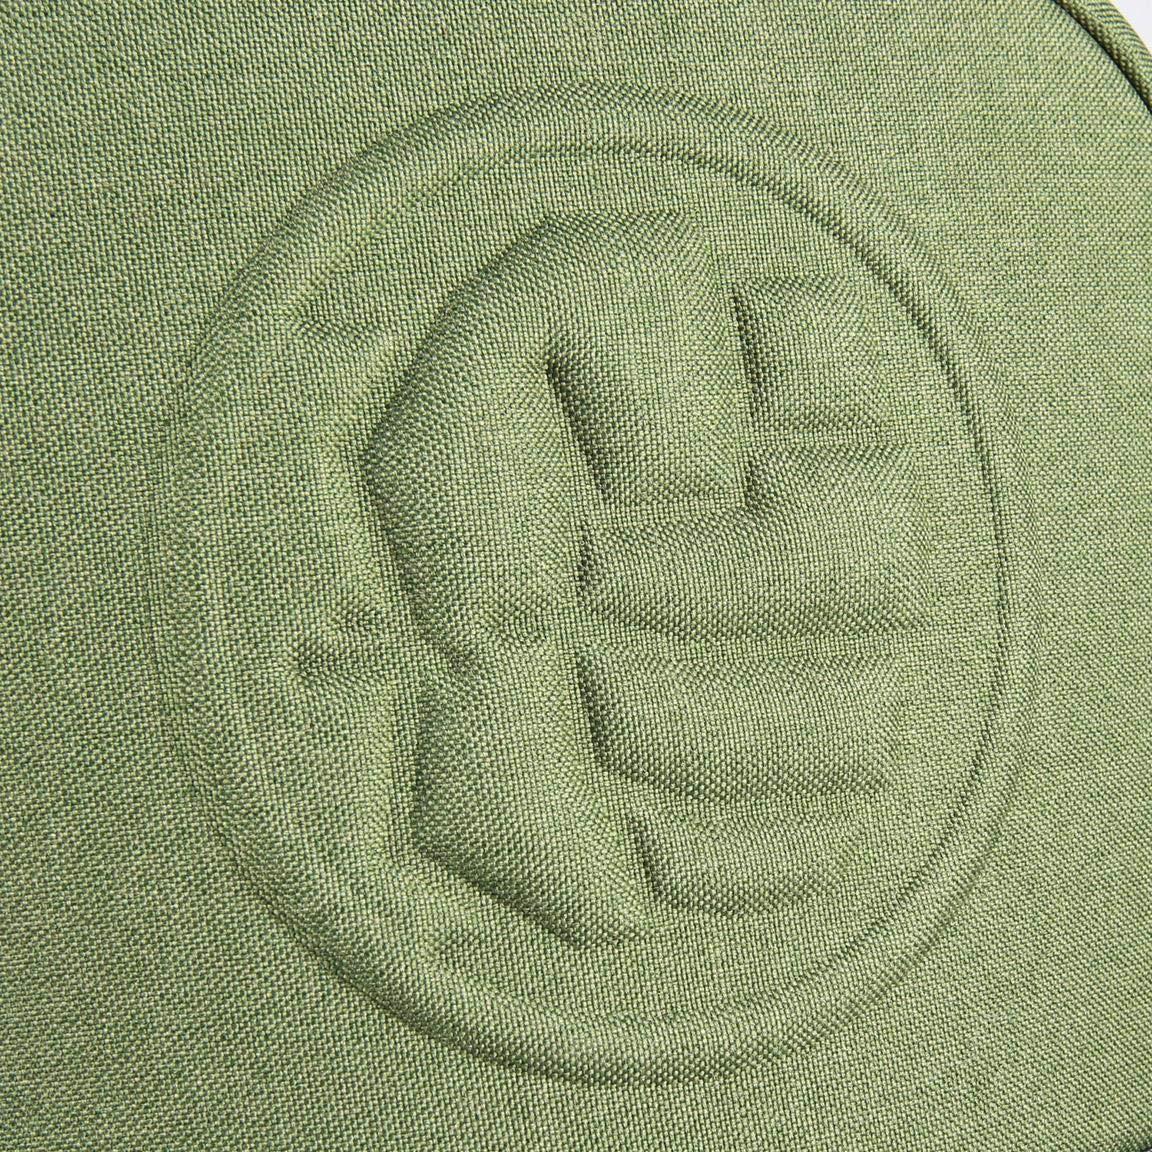 81s3W6XuhSL - Artesania Cerda Avengers Hulk - Mochila Escolar, 44 cm, Verde